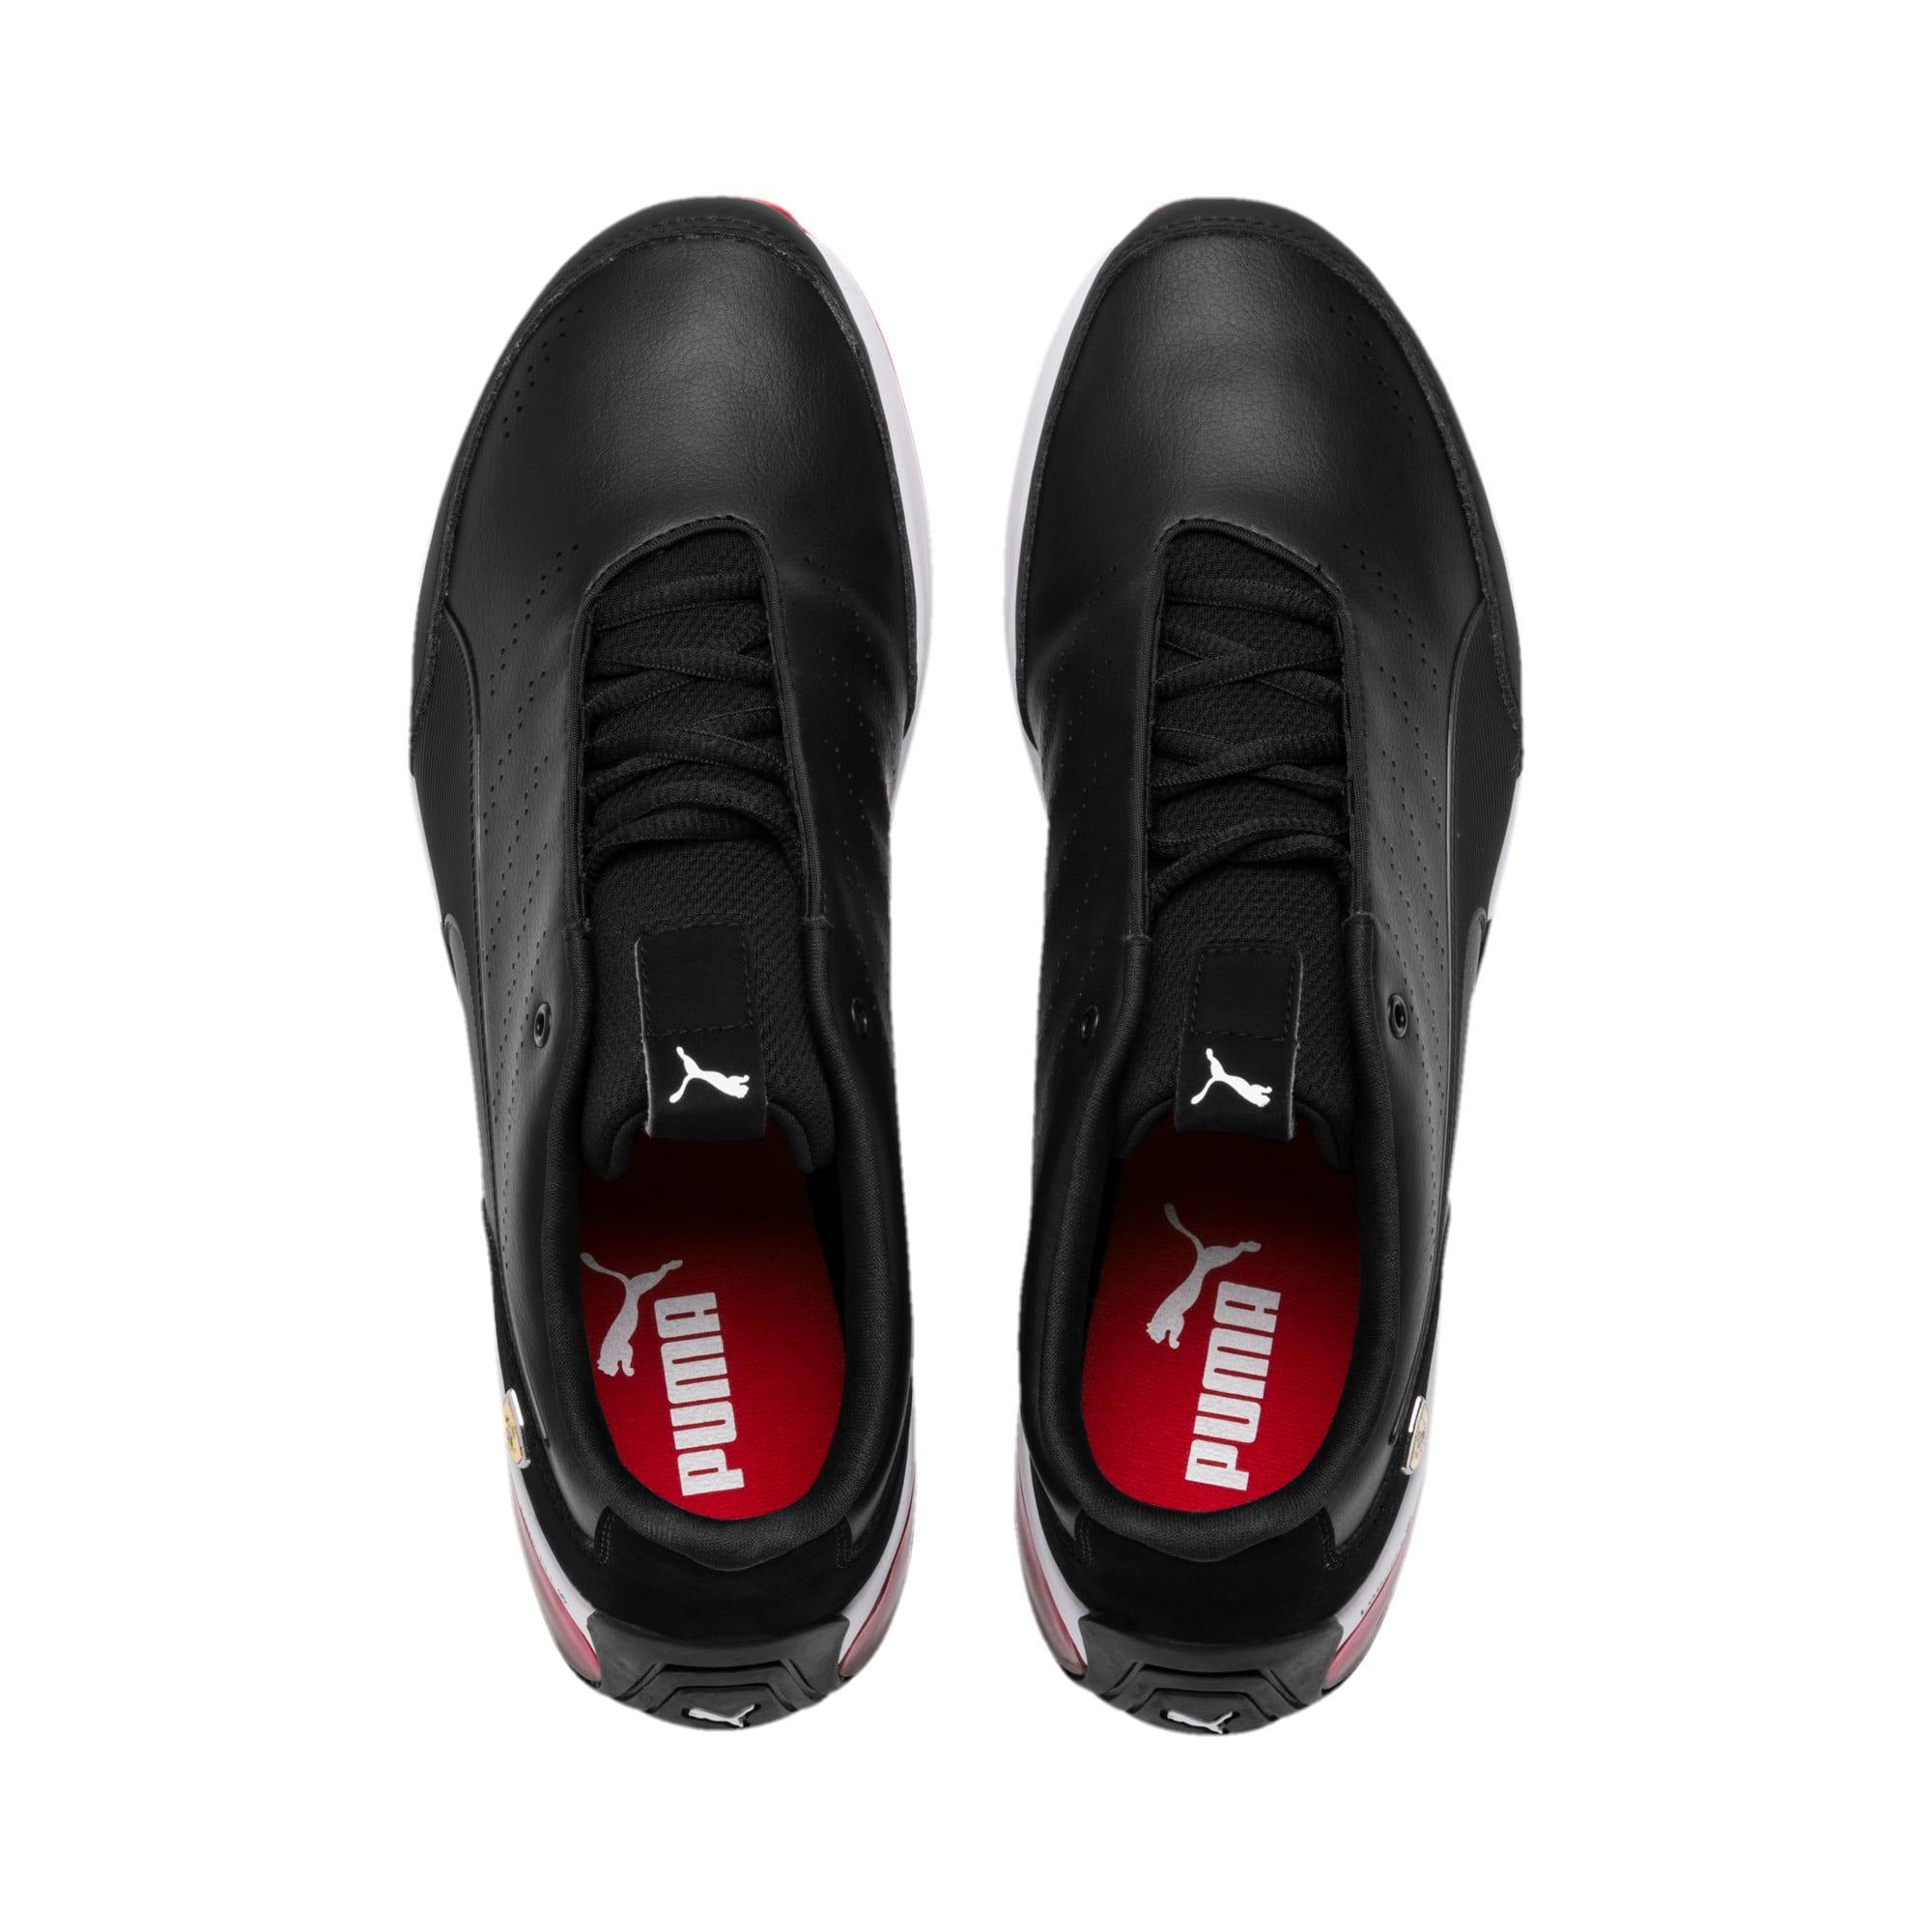 Thumbnail 7 of Scuderia Ferrari Kart Cat X Training Shoes, Puma Black-Puma Black, medium